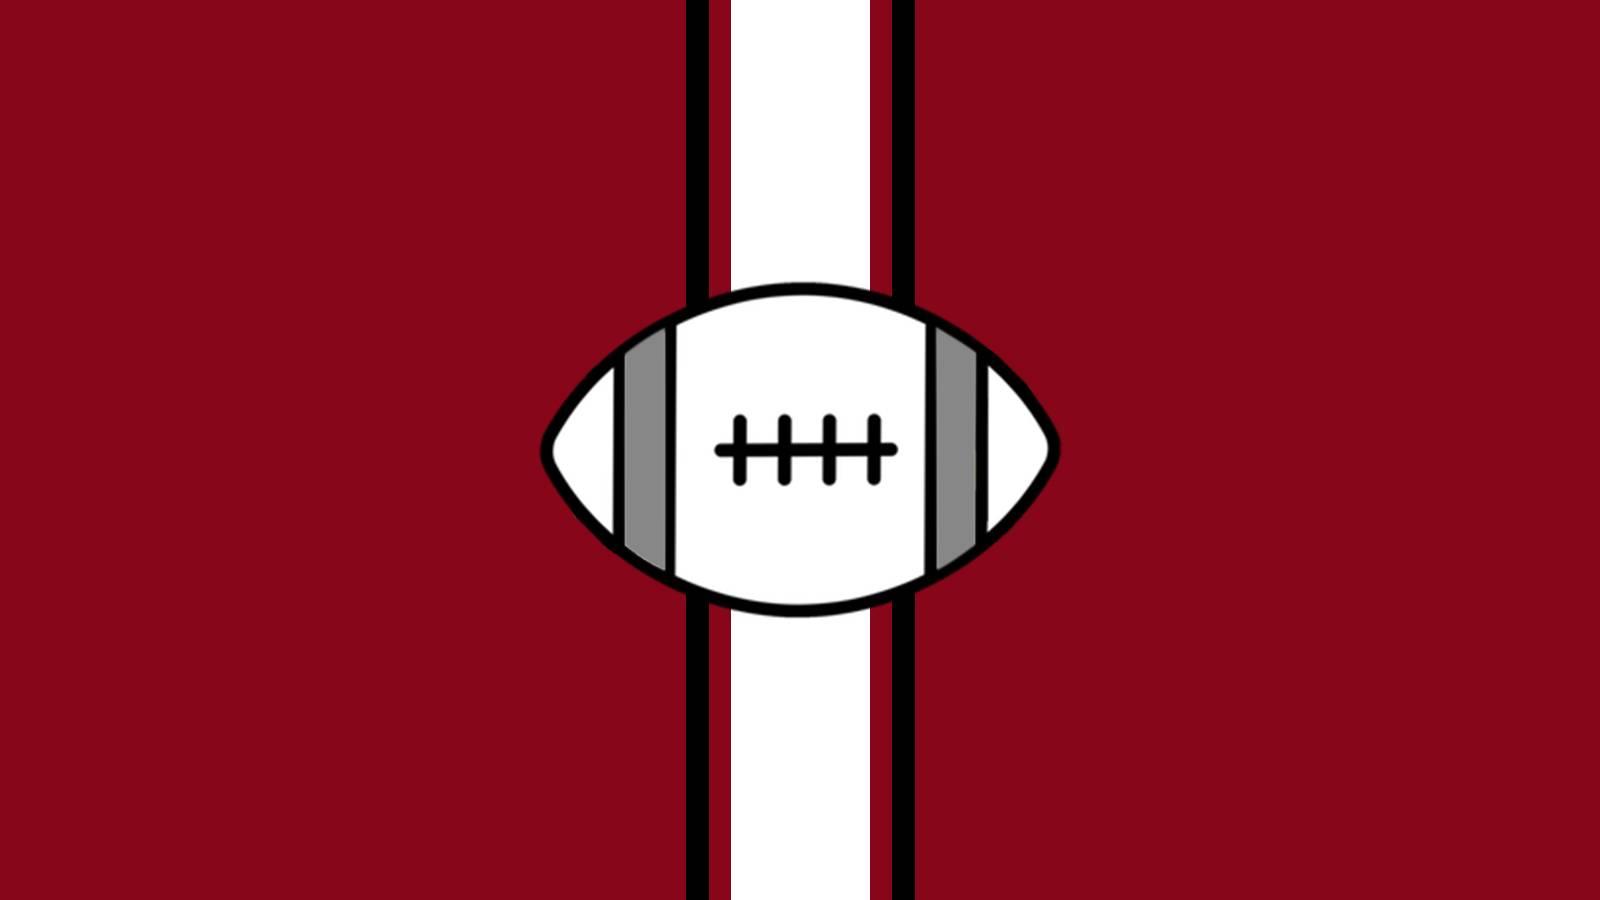 NFL Preseason - Denver Broncos at Arizona Cardinals